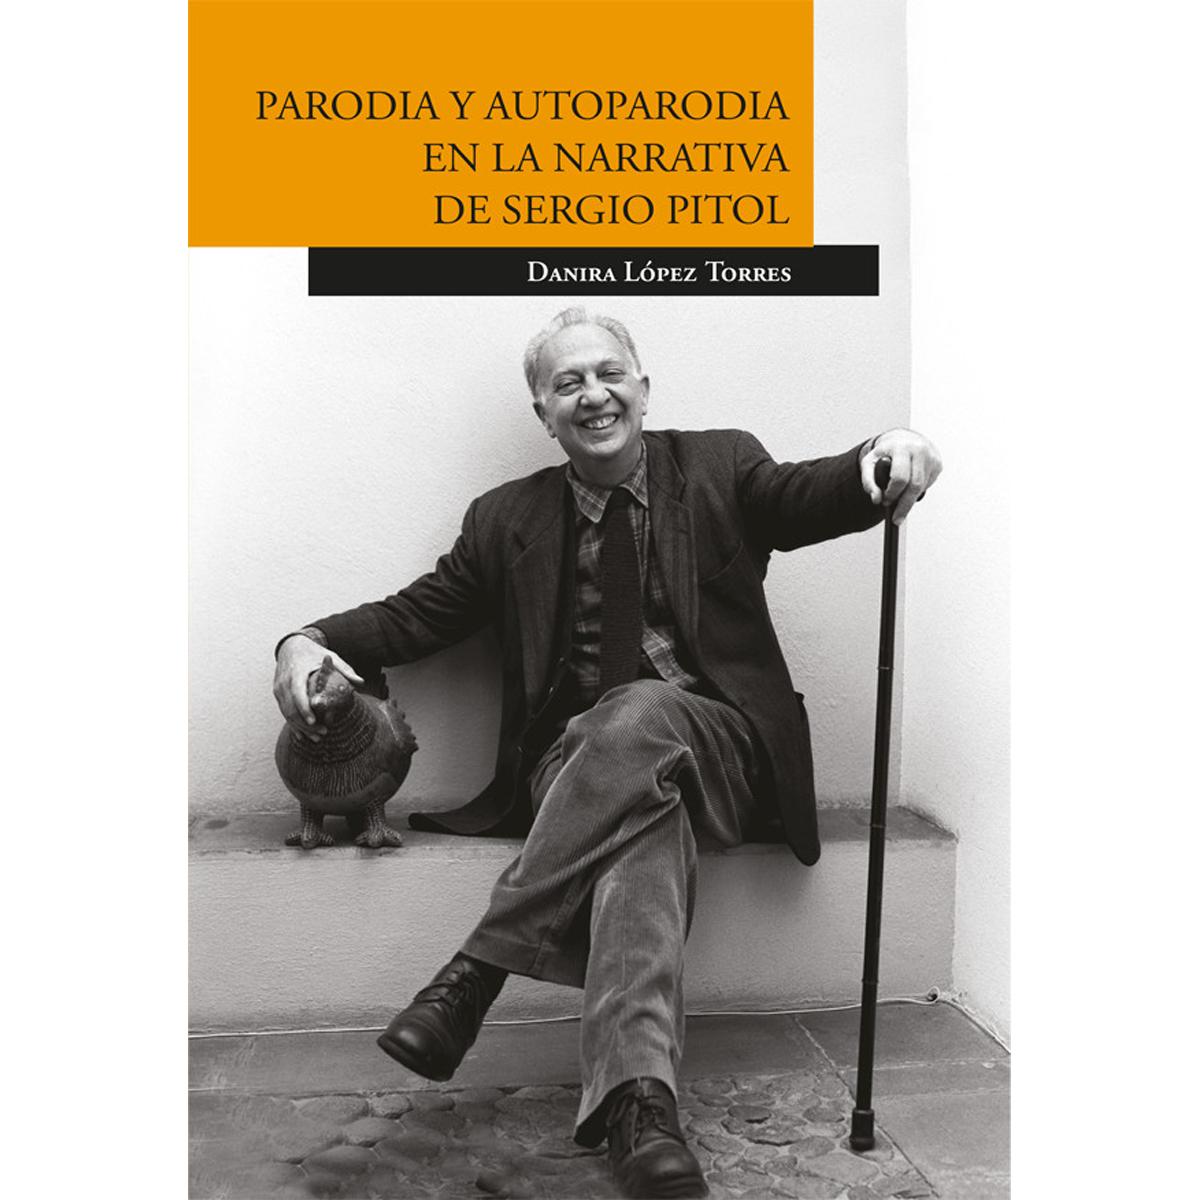 Parodia y autoparodia en la narrativa de Sergio Pitol